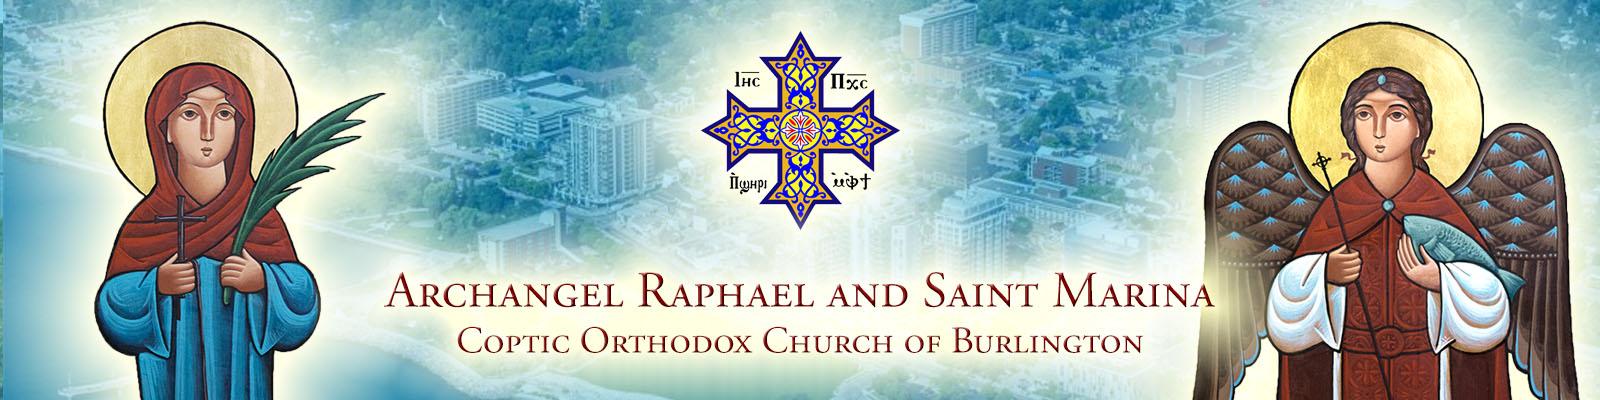 Archangel Raphael & Saint Marina